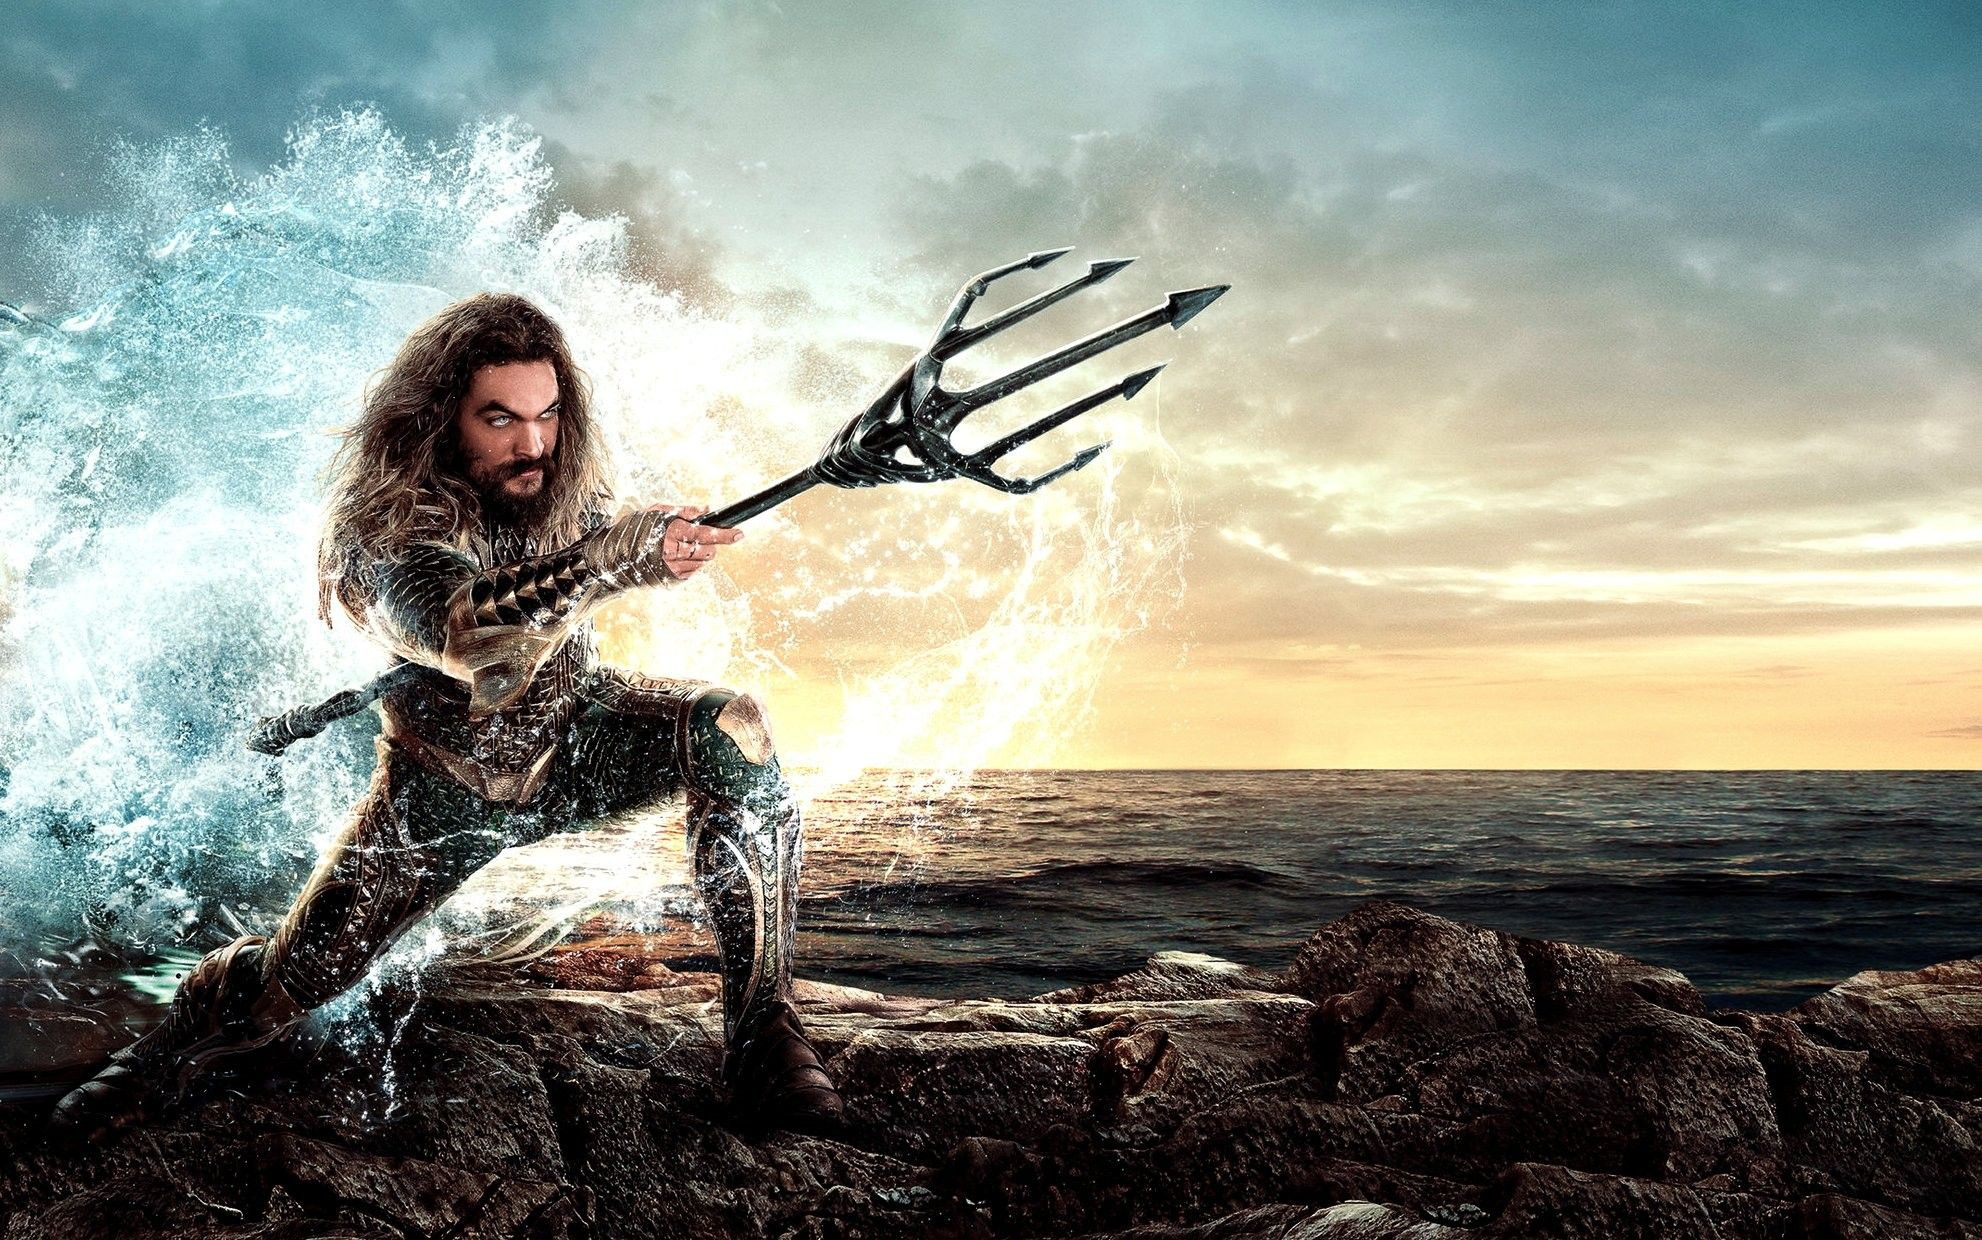 Aquman Aquaman Superhero Movies Jason Momoa Aquaman